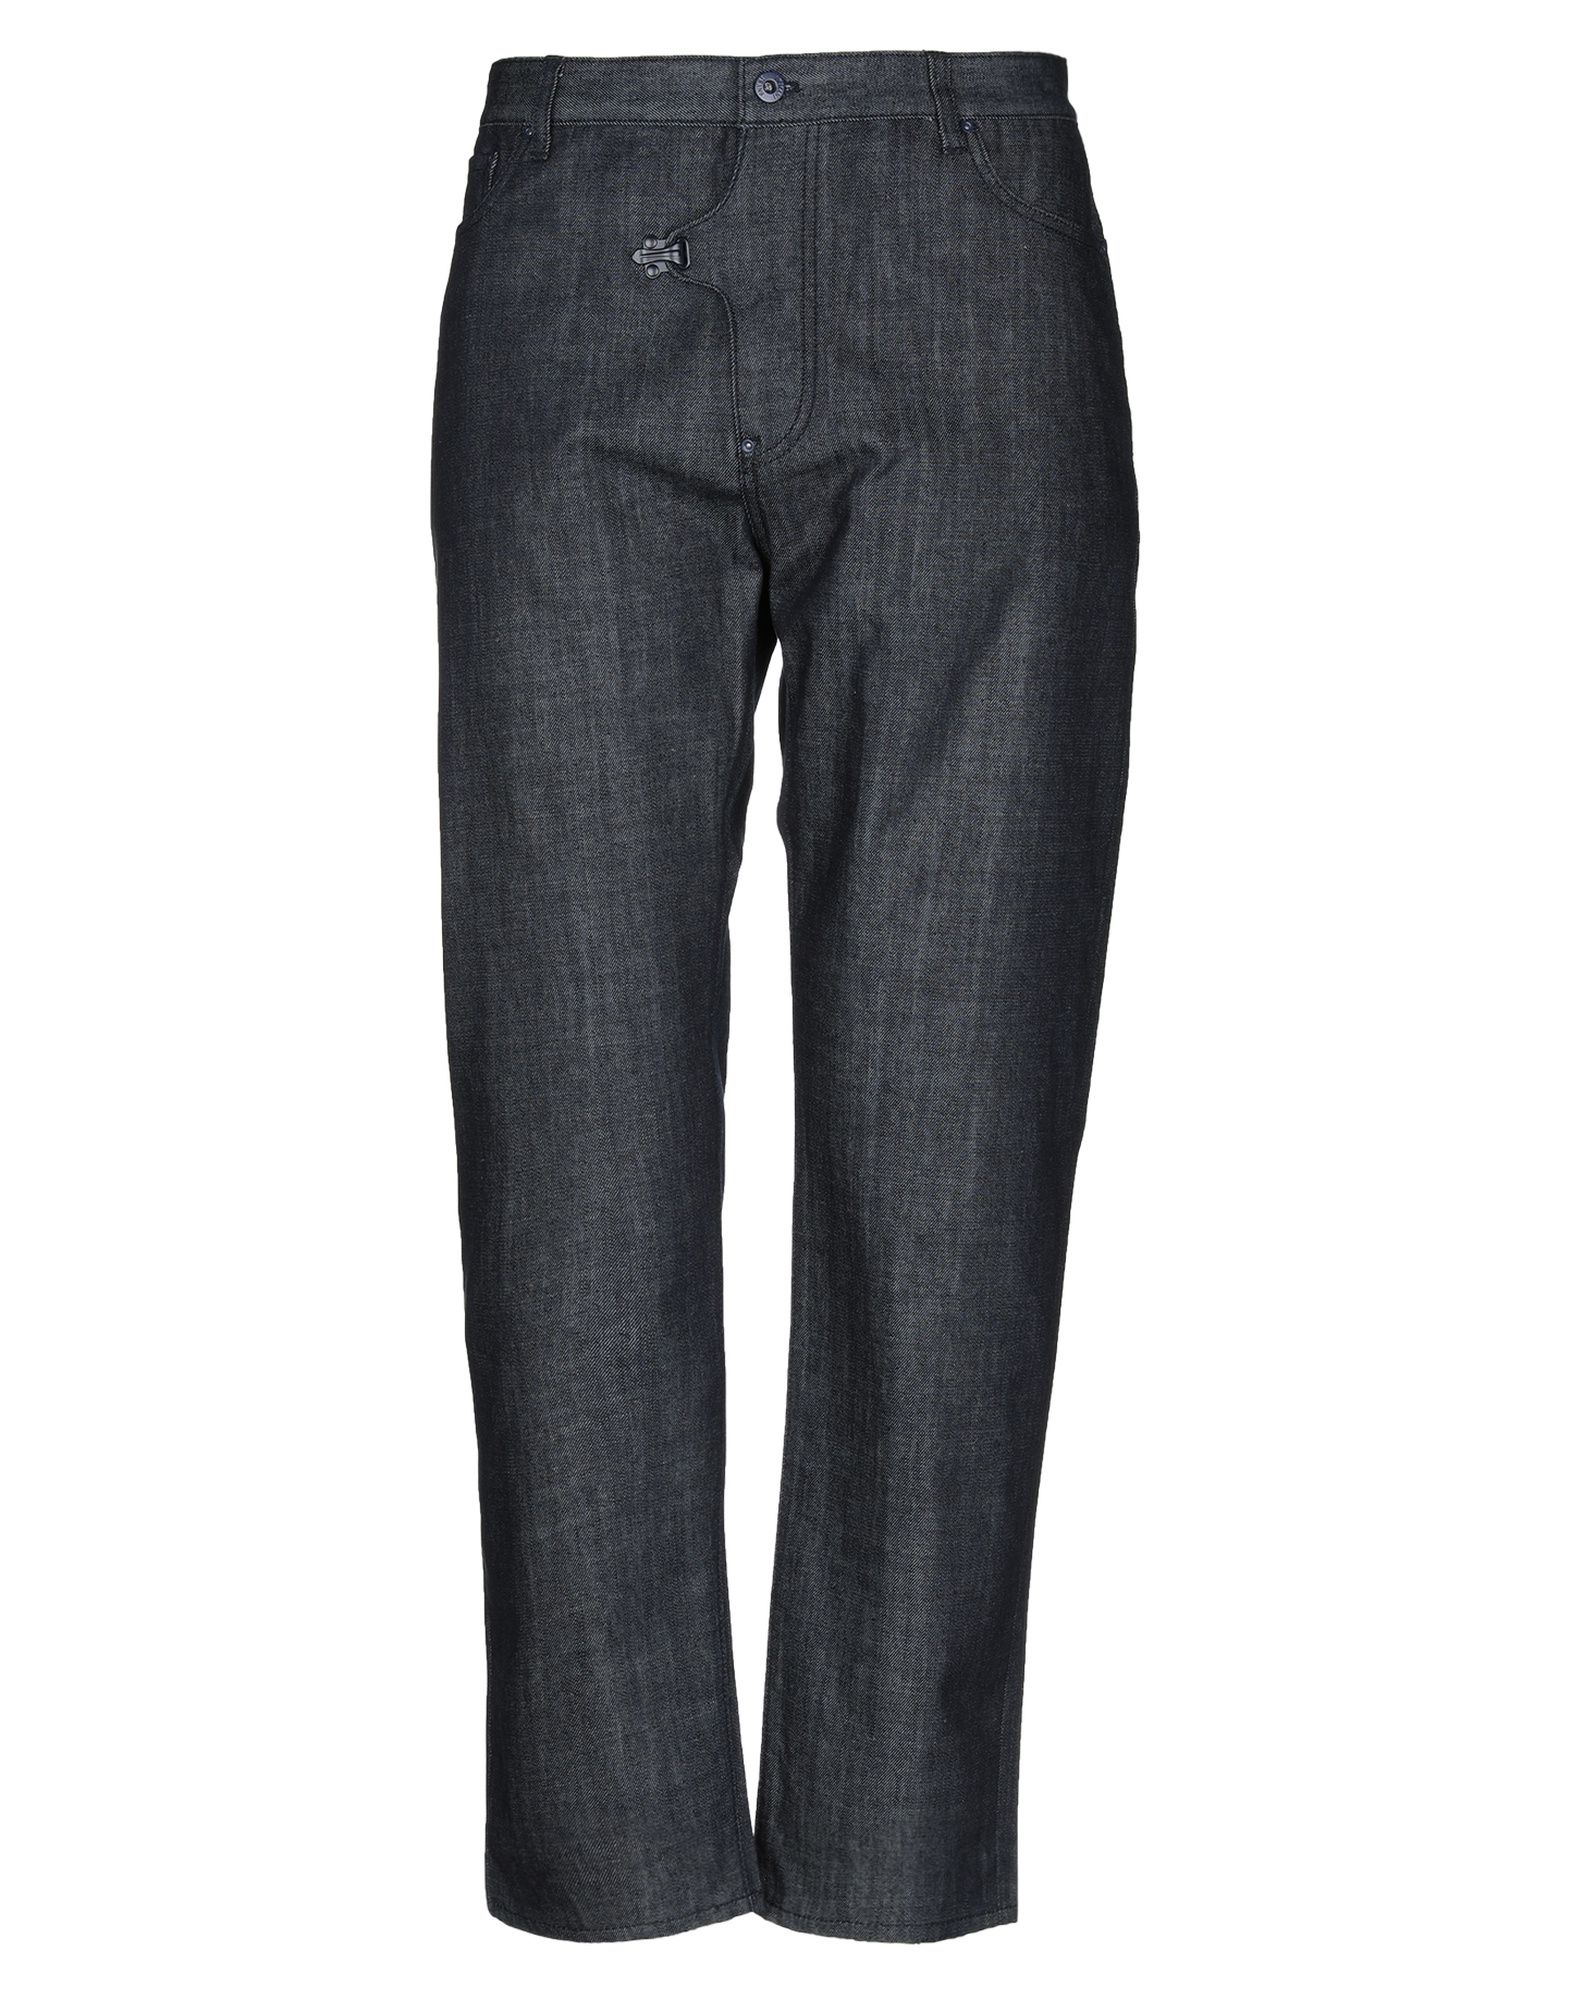 Fashion Shop - ARMANI JEANS Denim pants - Item 42723111